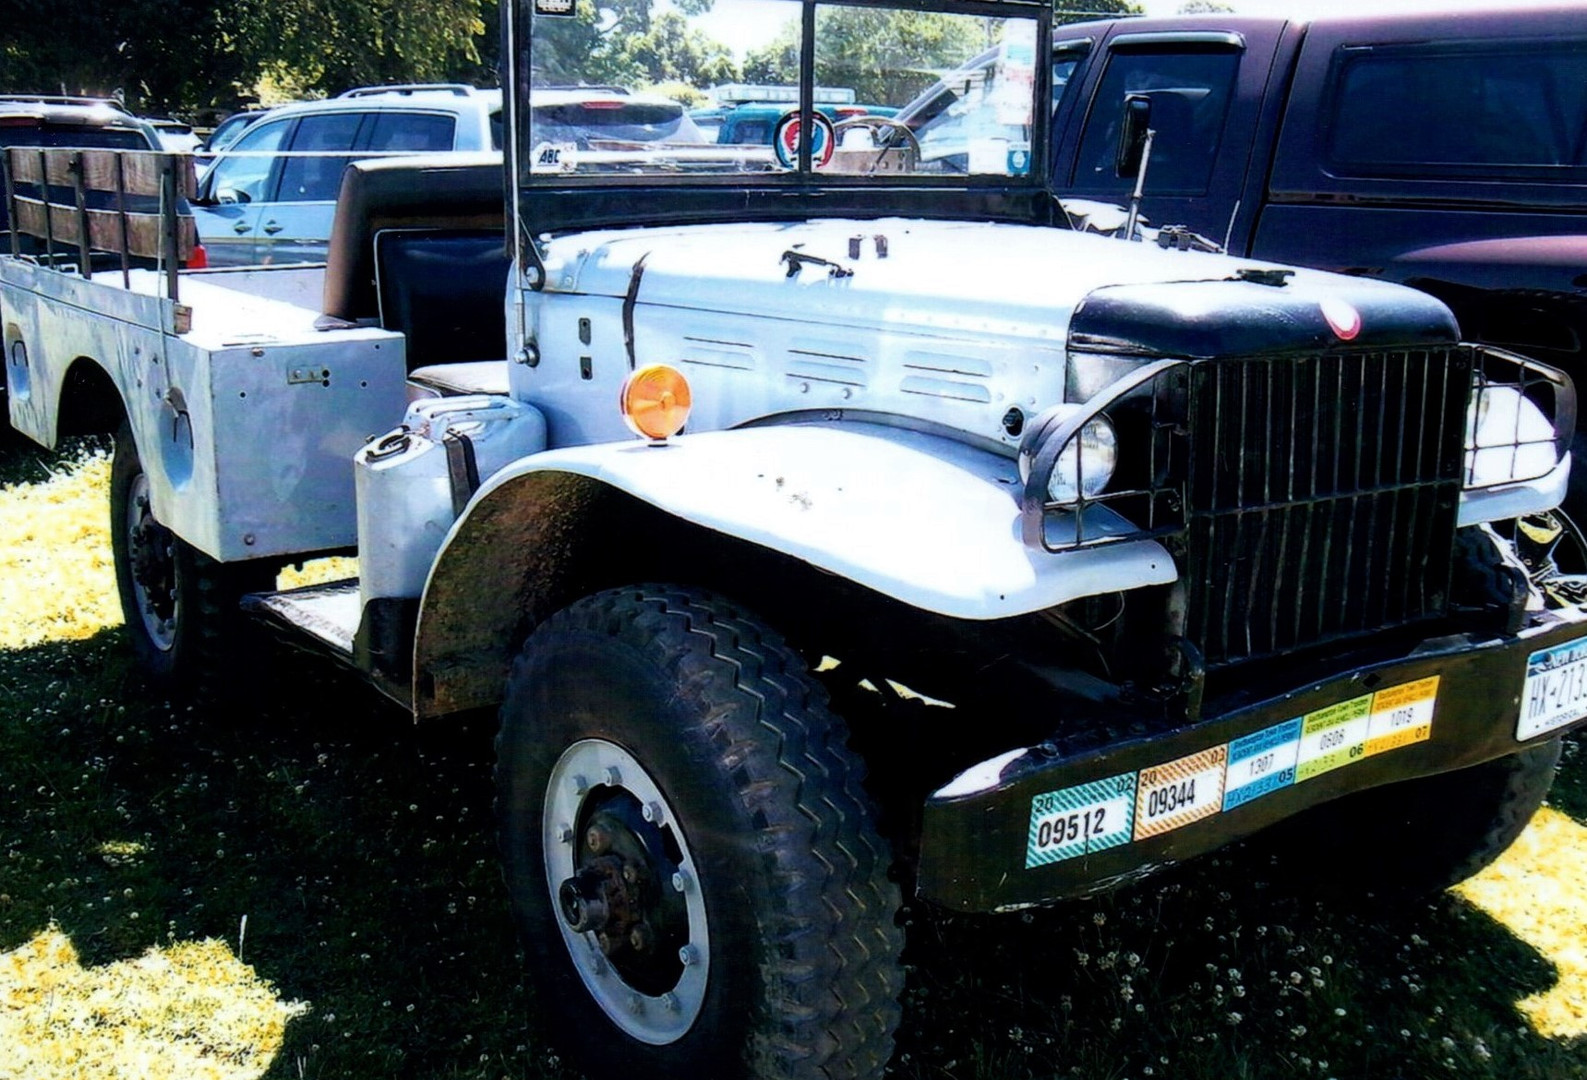 1942 Dodge WC21 command car - Greg King